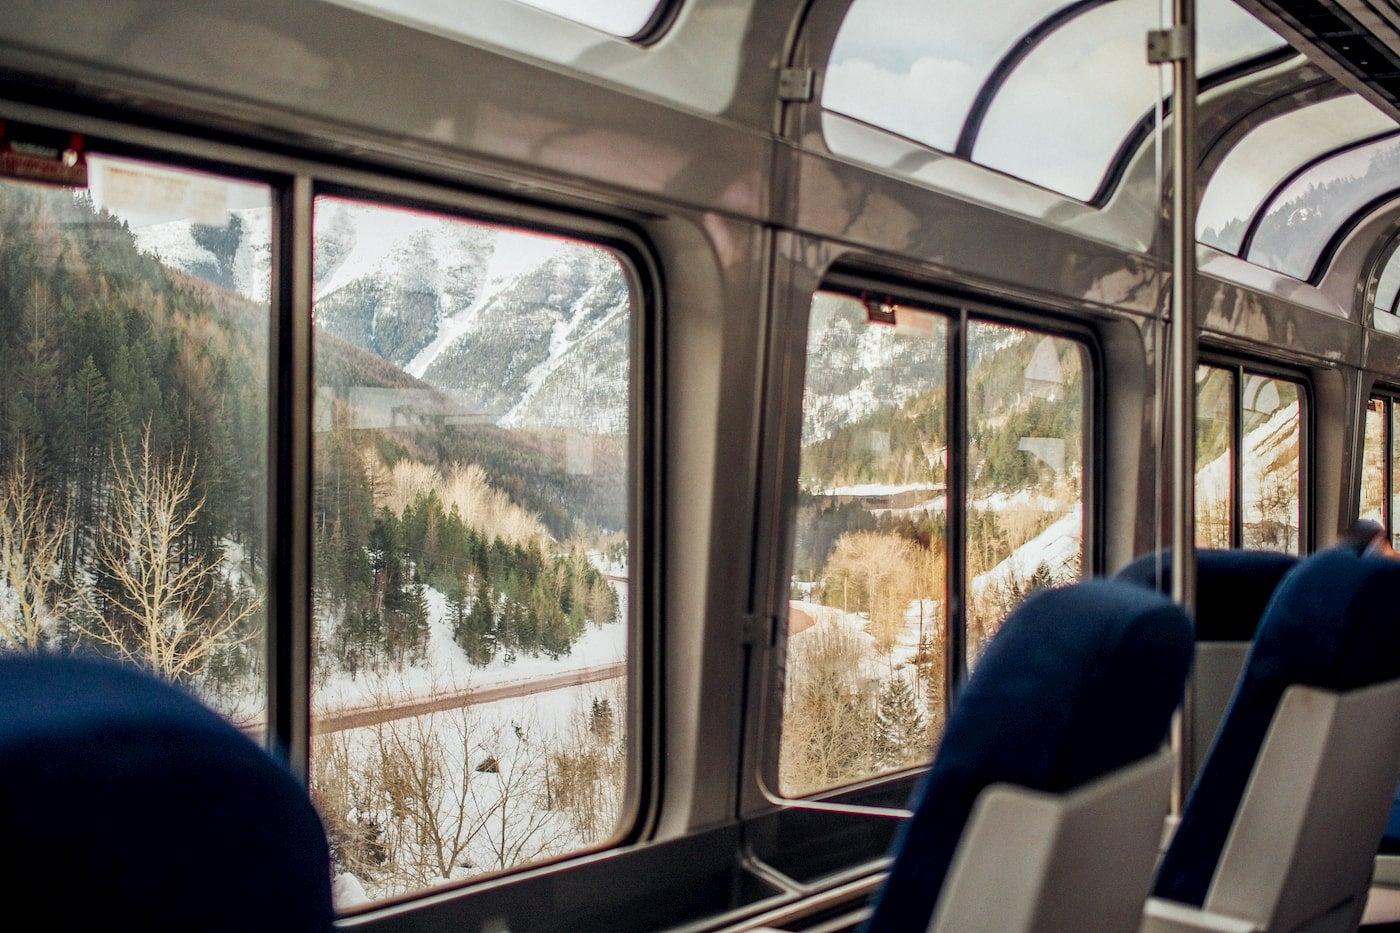 Western alpine landscape from the windows of a AMTRAK train car.